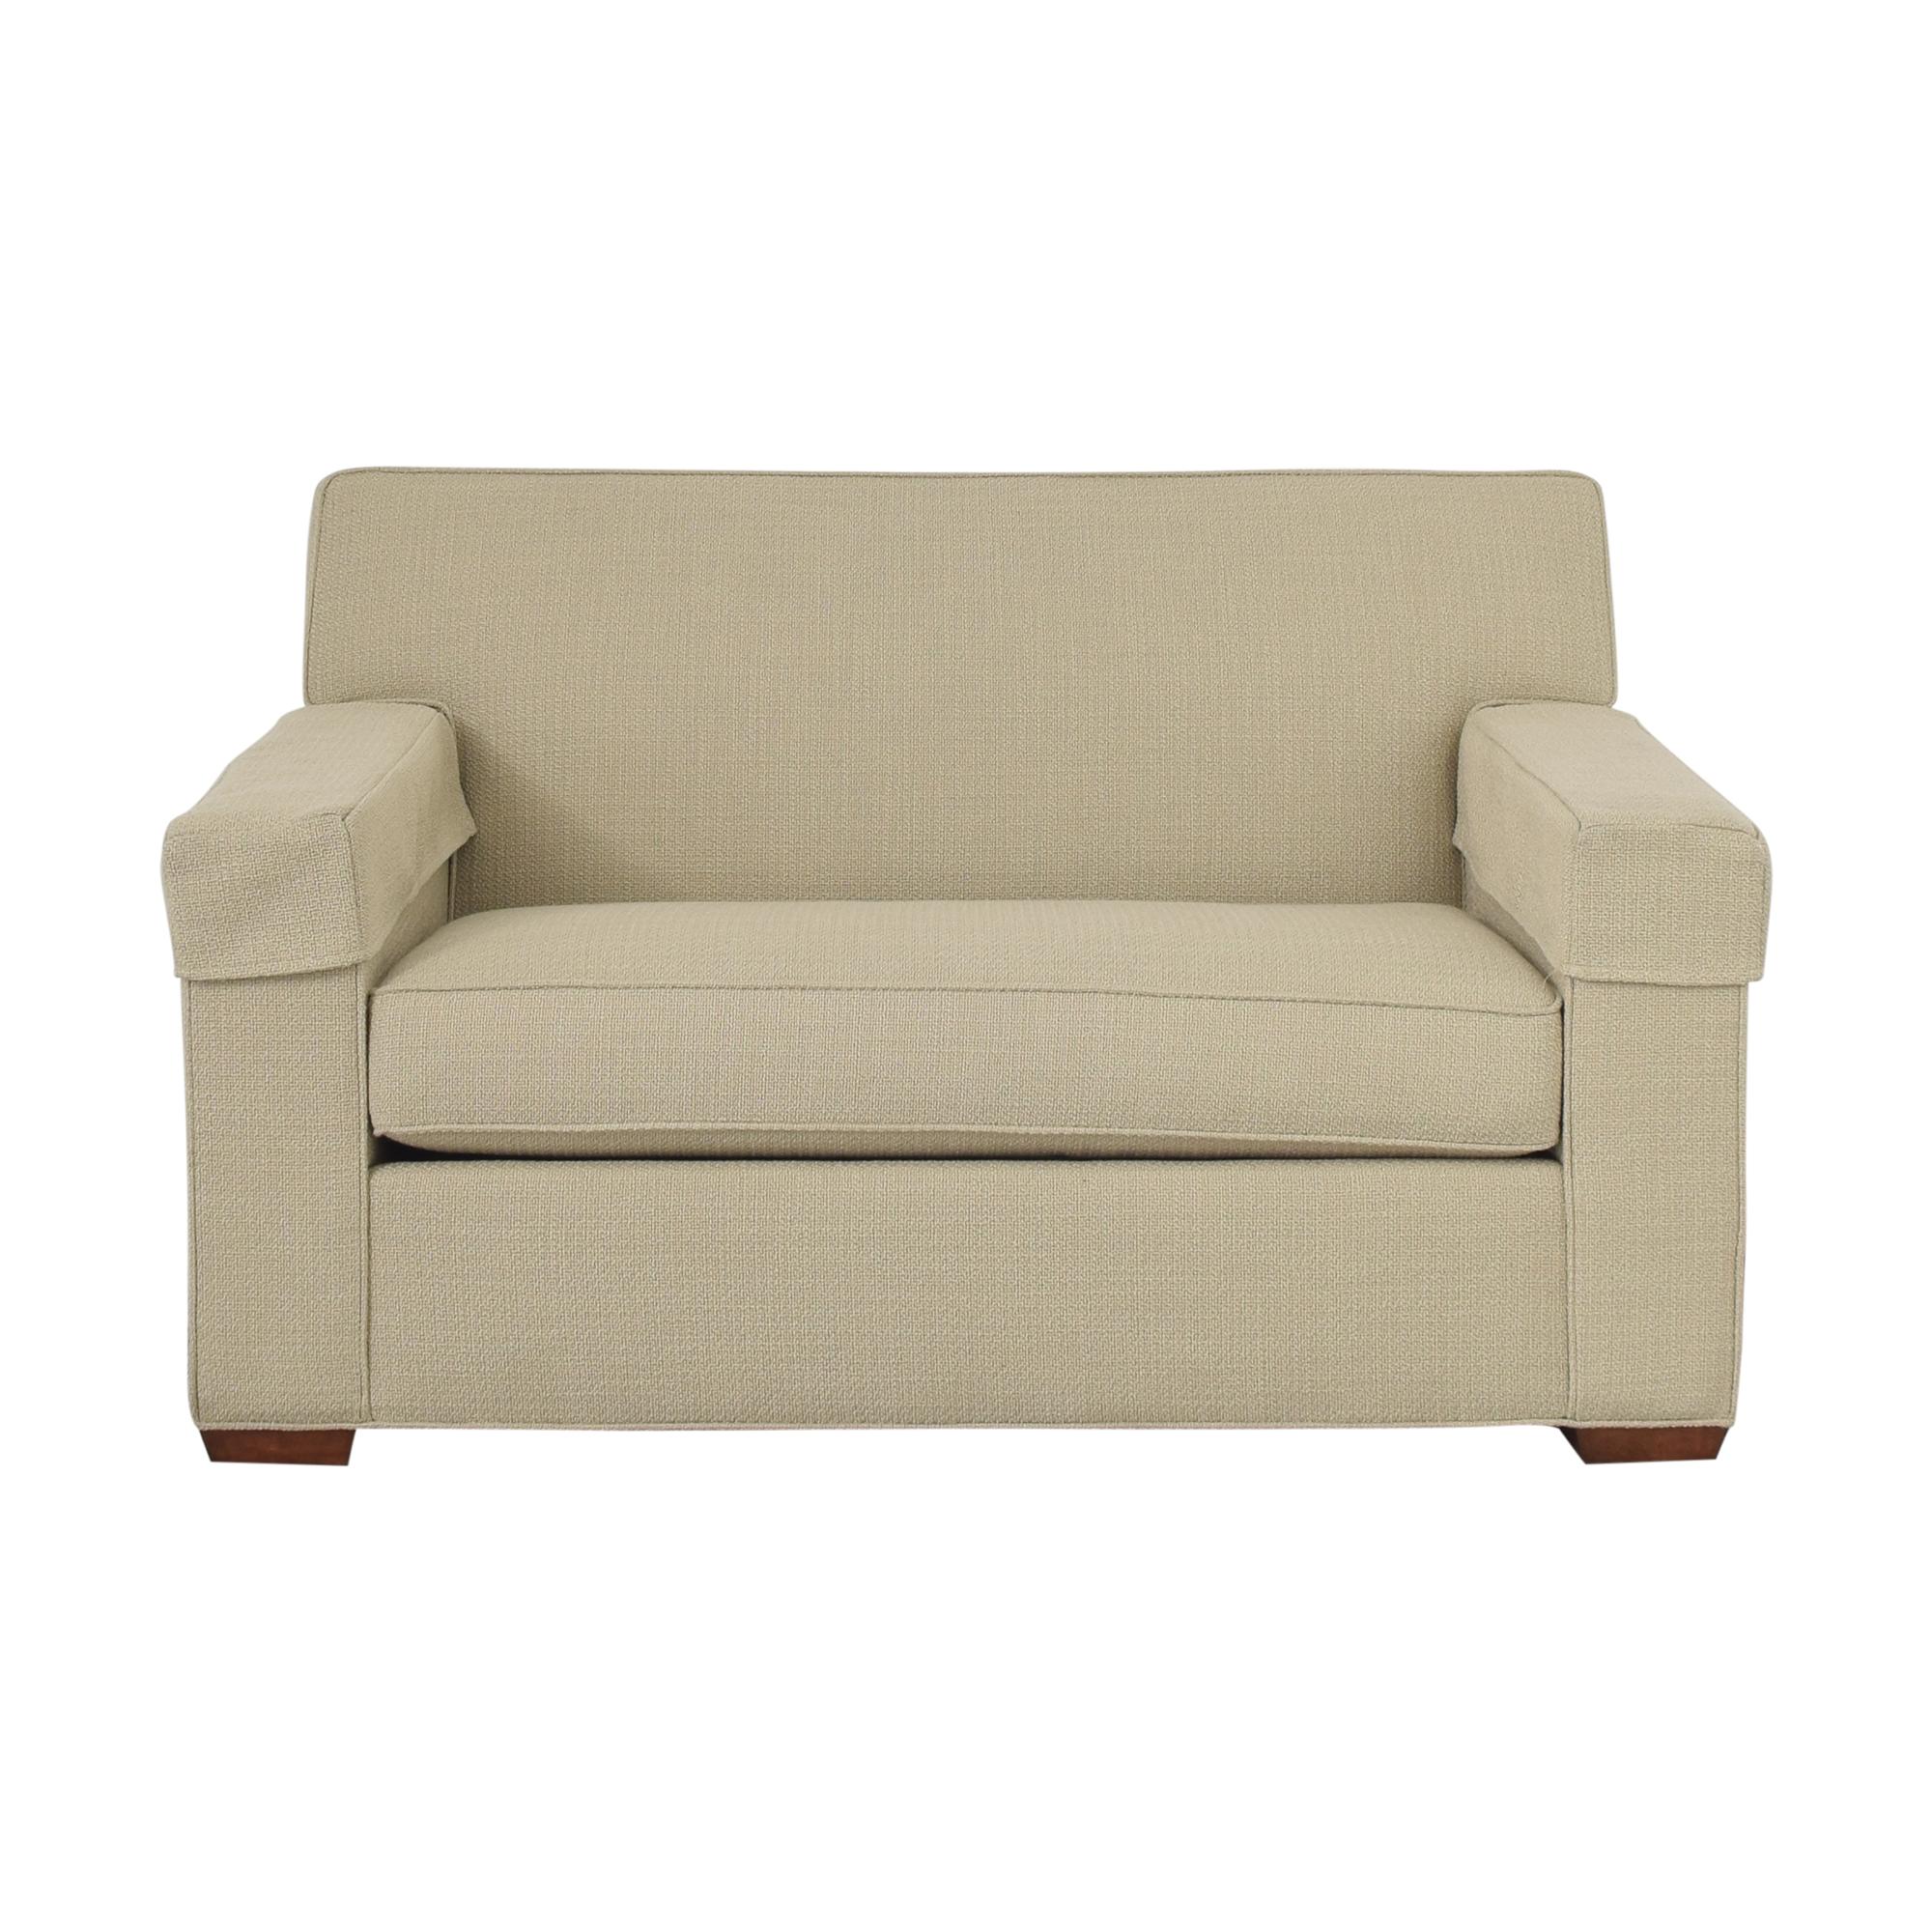 buy Ethan Allen Chair-and-a-Half Twin Sleeper Ethan Allen Loveseats